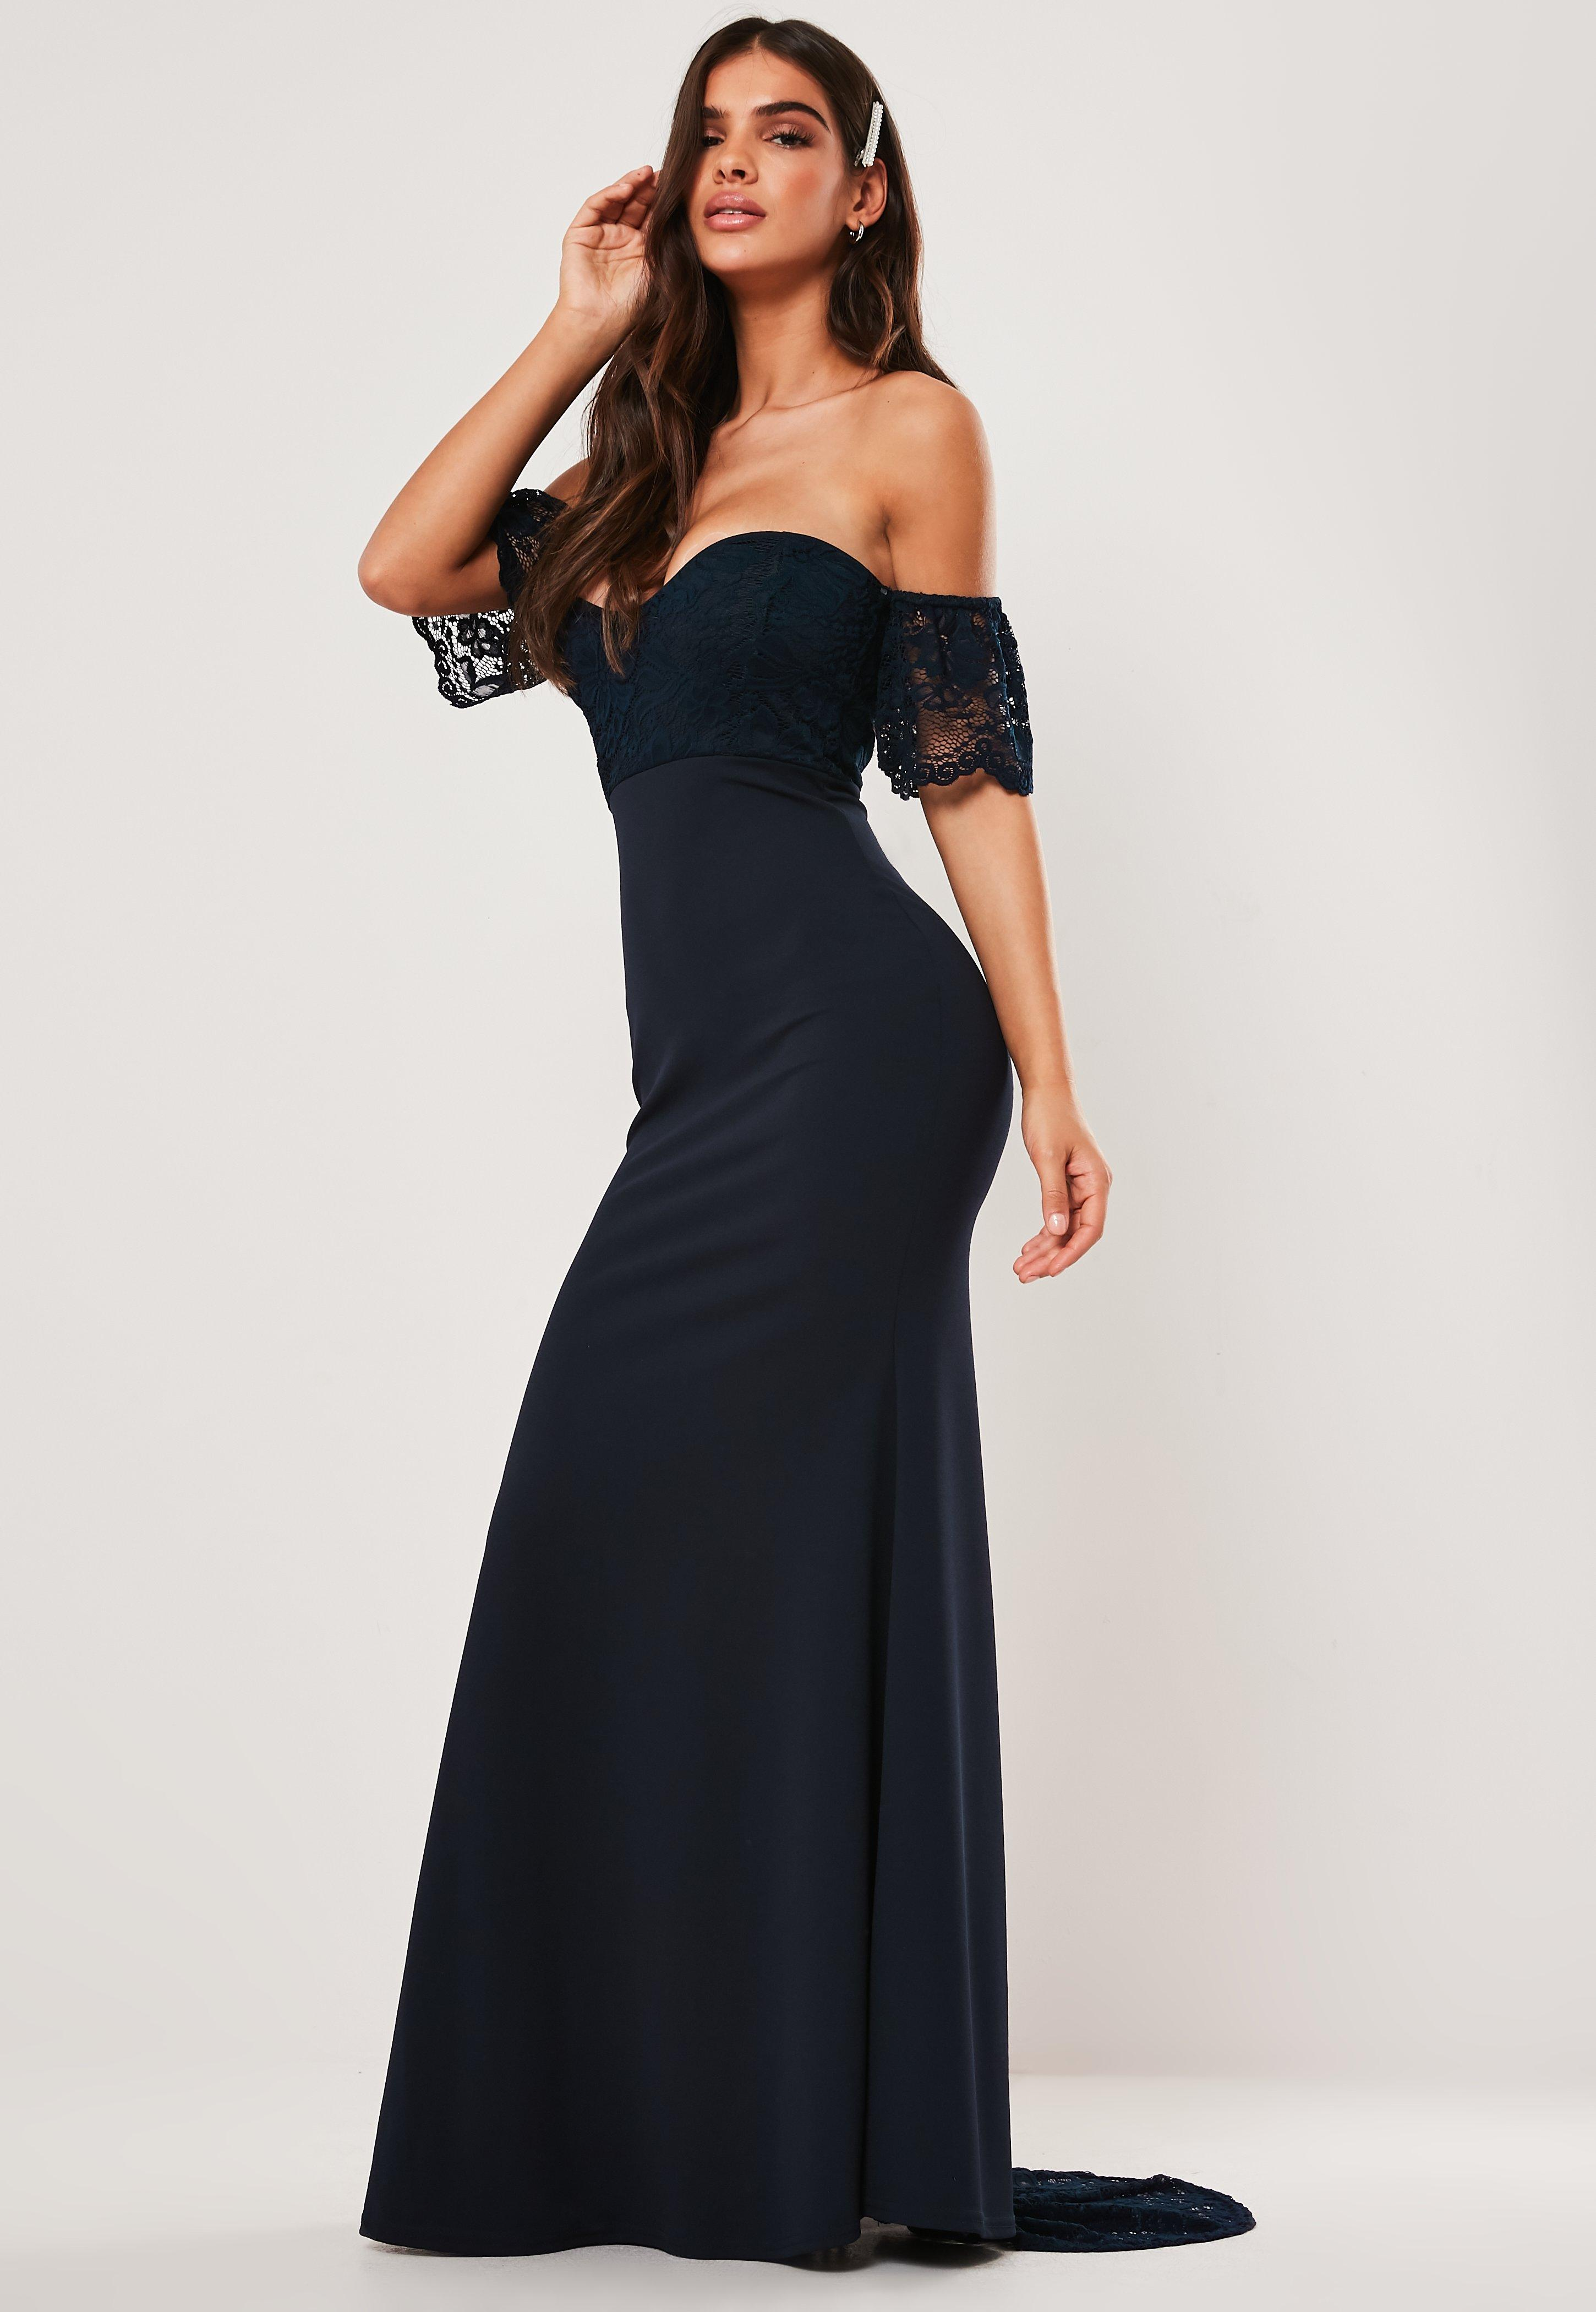 8498a9e51 Prom Dresses 2019 | Long & Short Dance Dresses - Missguided